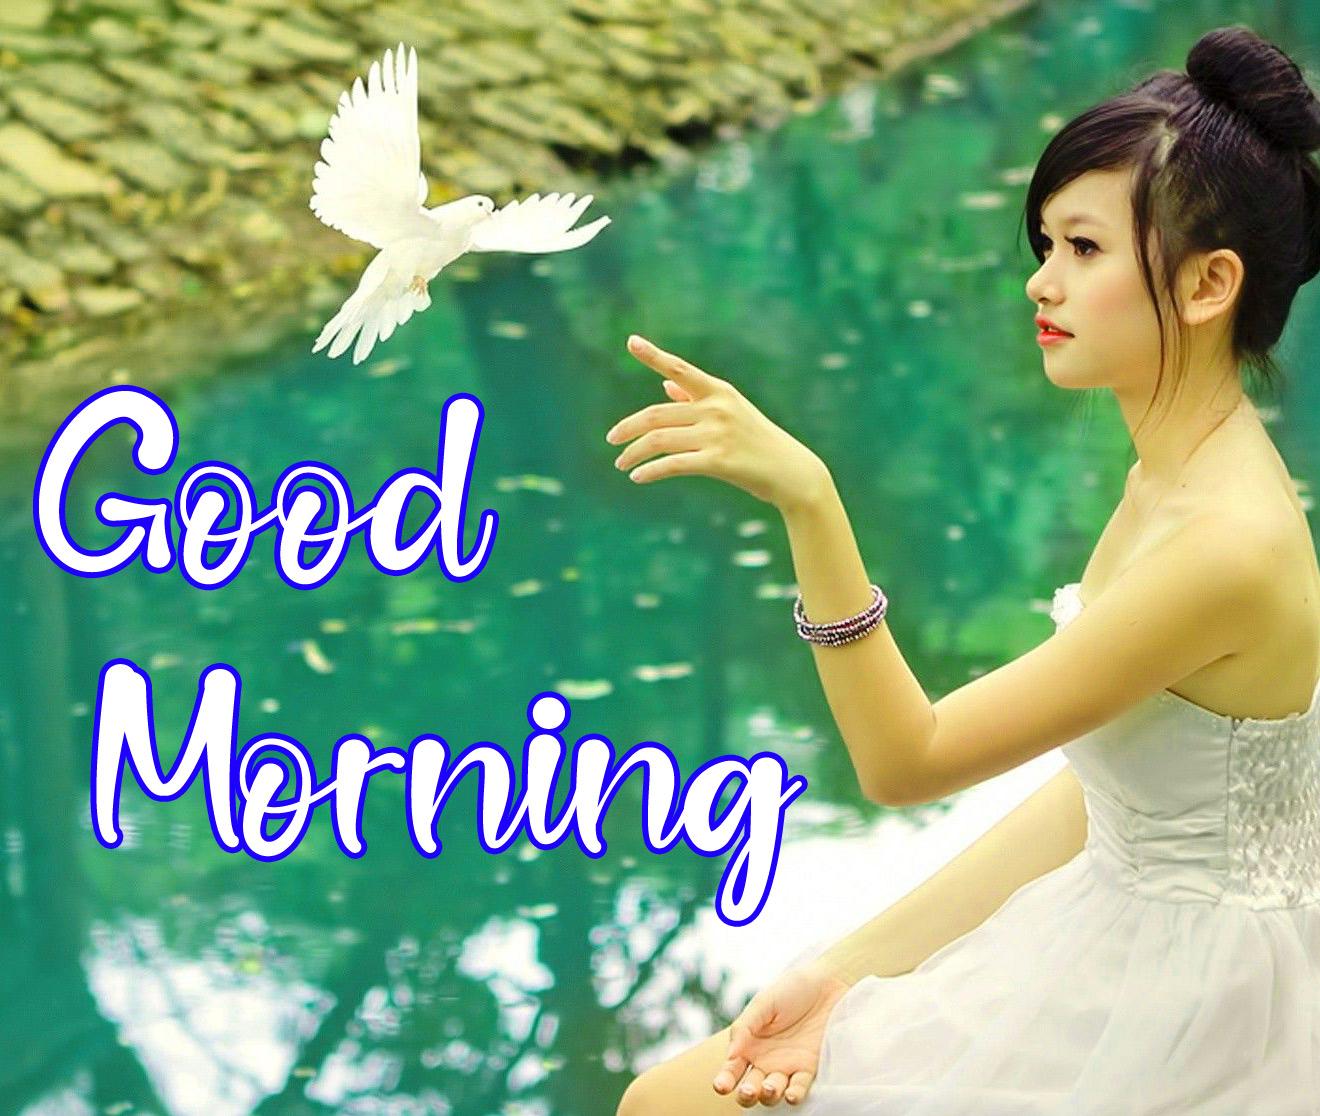 good morning Images for girls 11